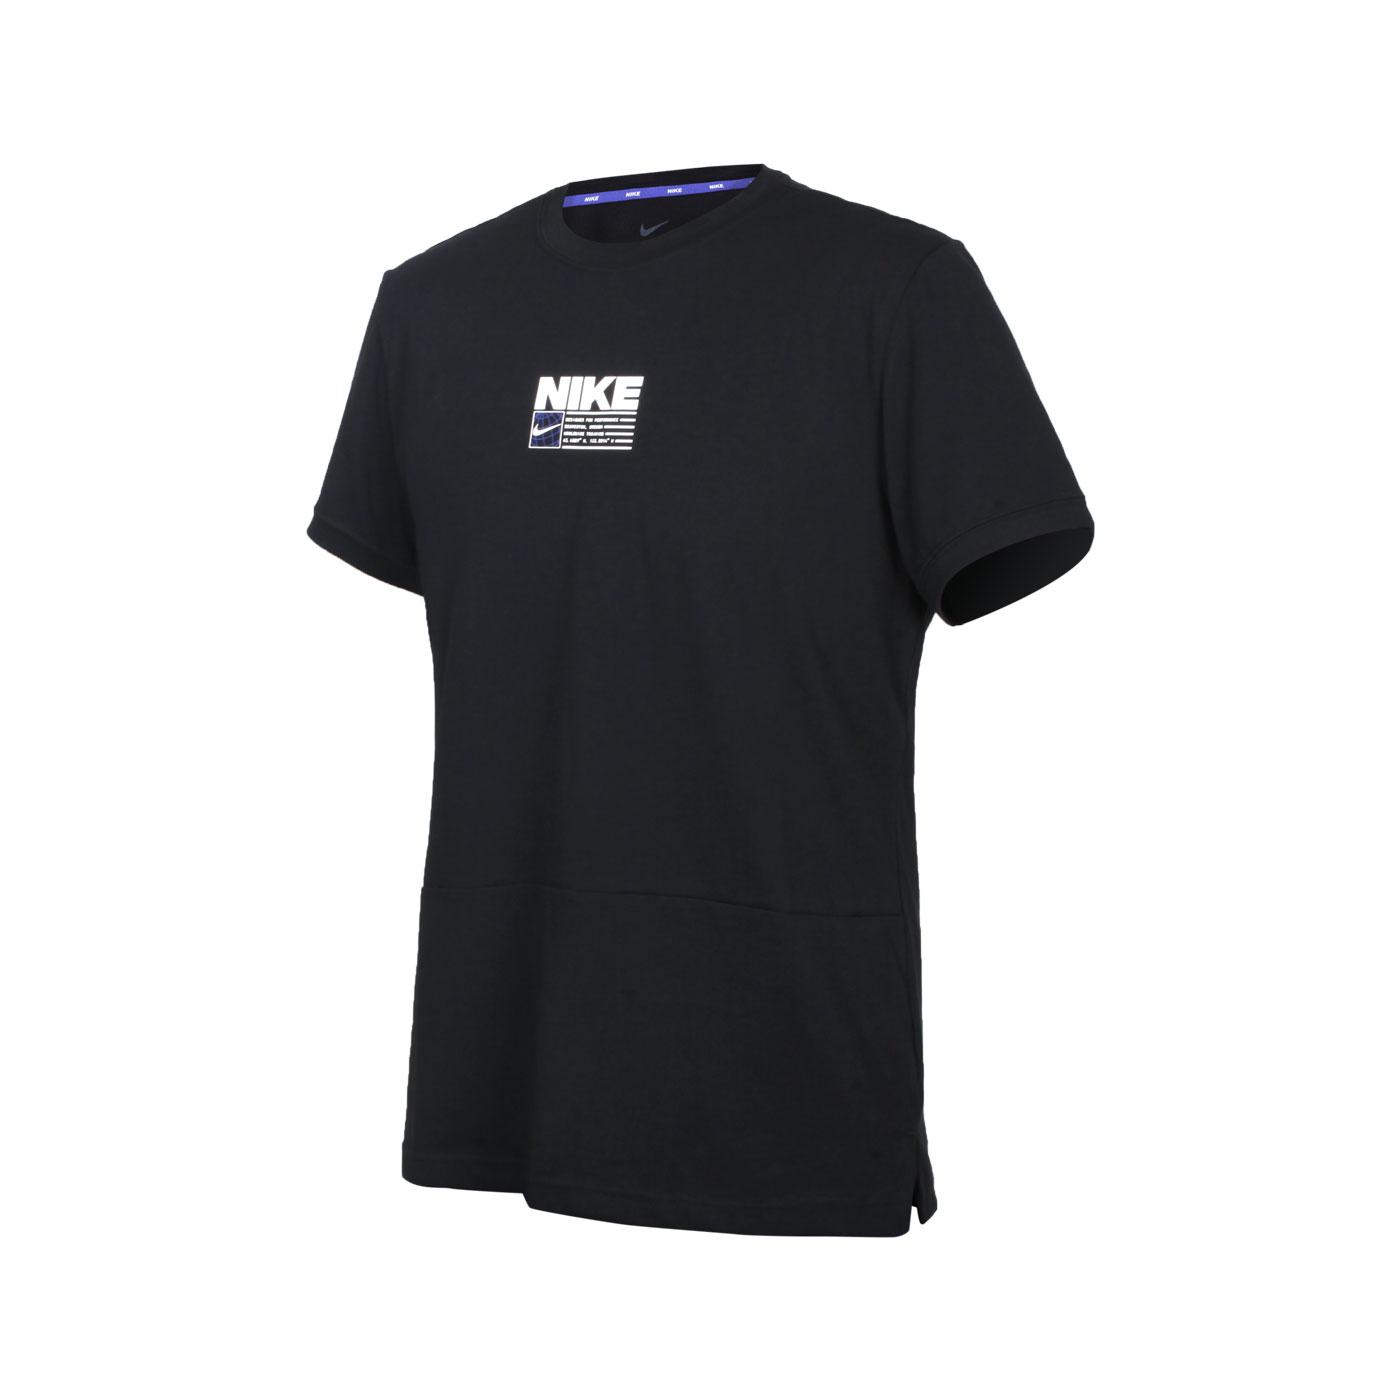 NIKE 男款短袖T恤 CZ2575-010